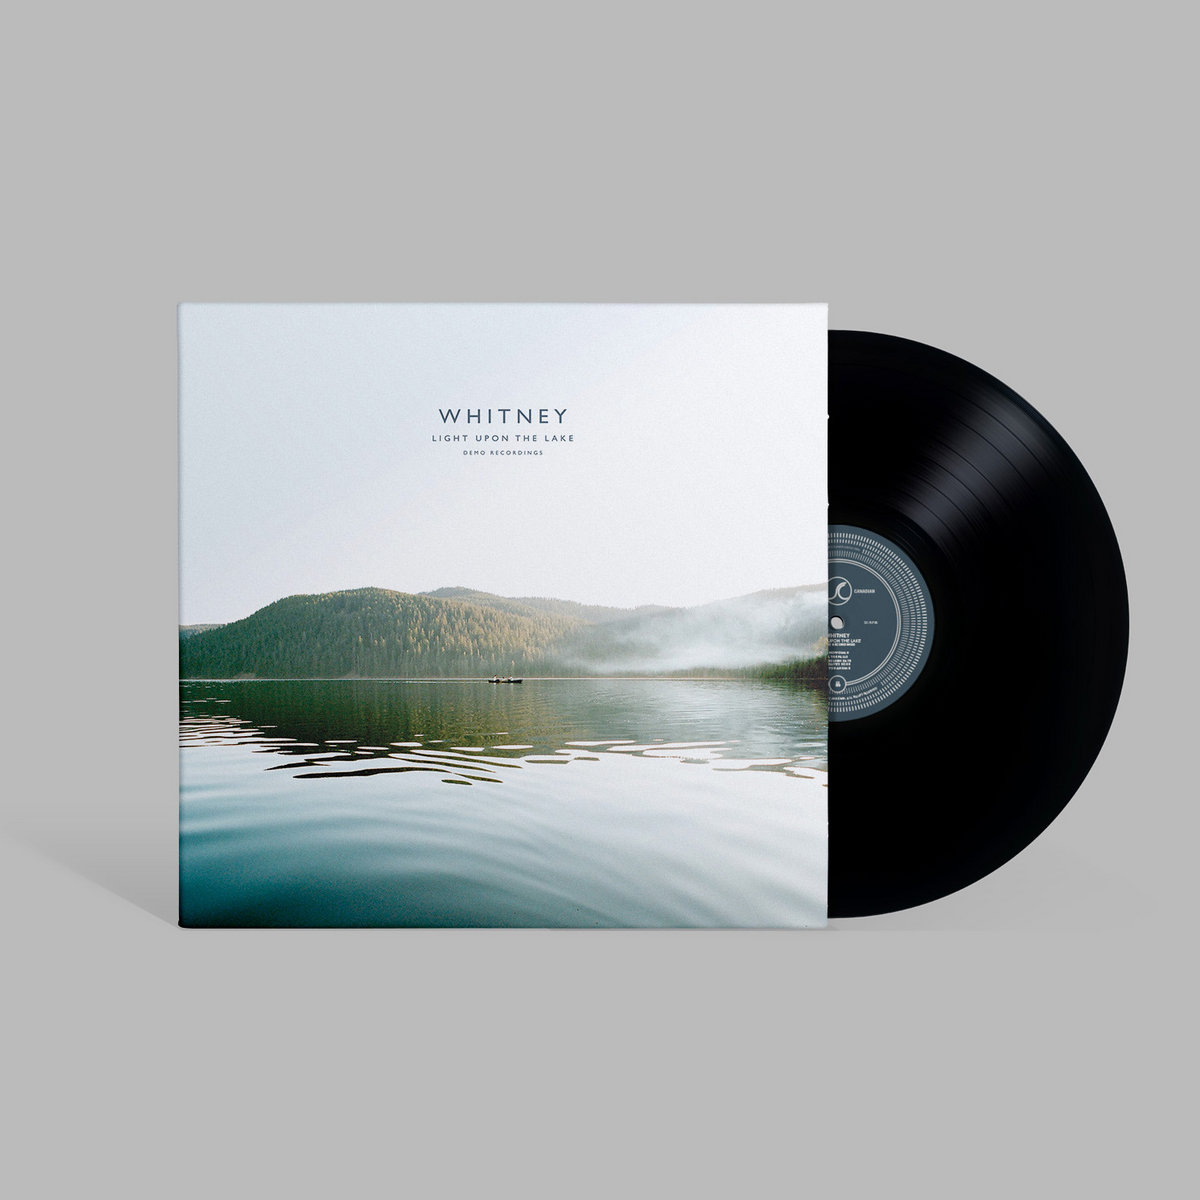 whitney light upon the lake album